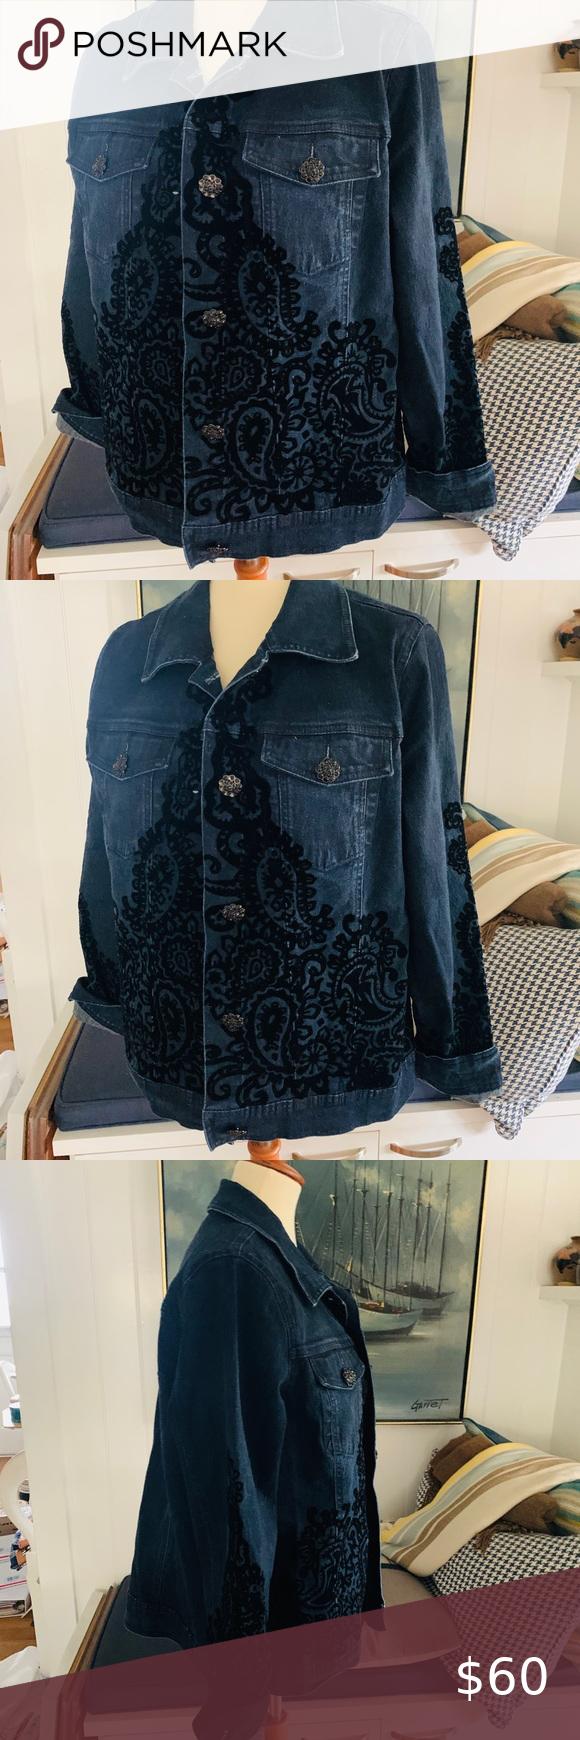 Dg2 By Diane Gilman Blue Jean Jacket With Flock Blue Jean Jacket Jean Jacket Diane Gilman [ 1740 x 580 Pixel ]